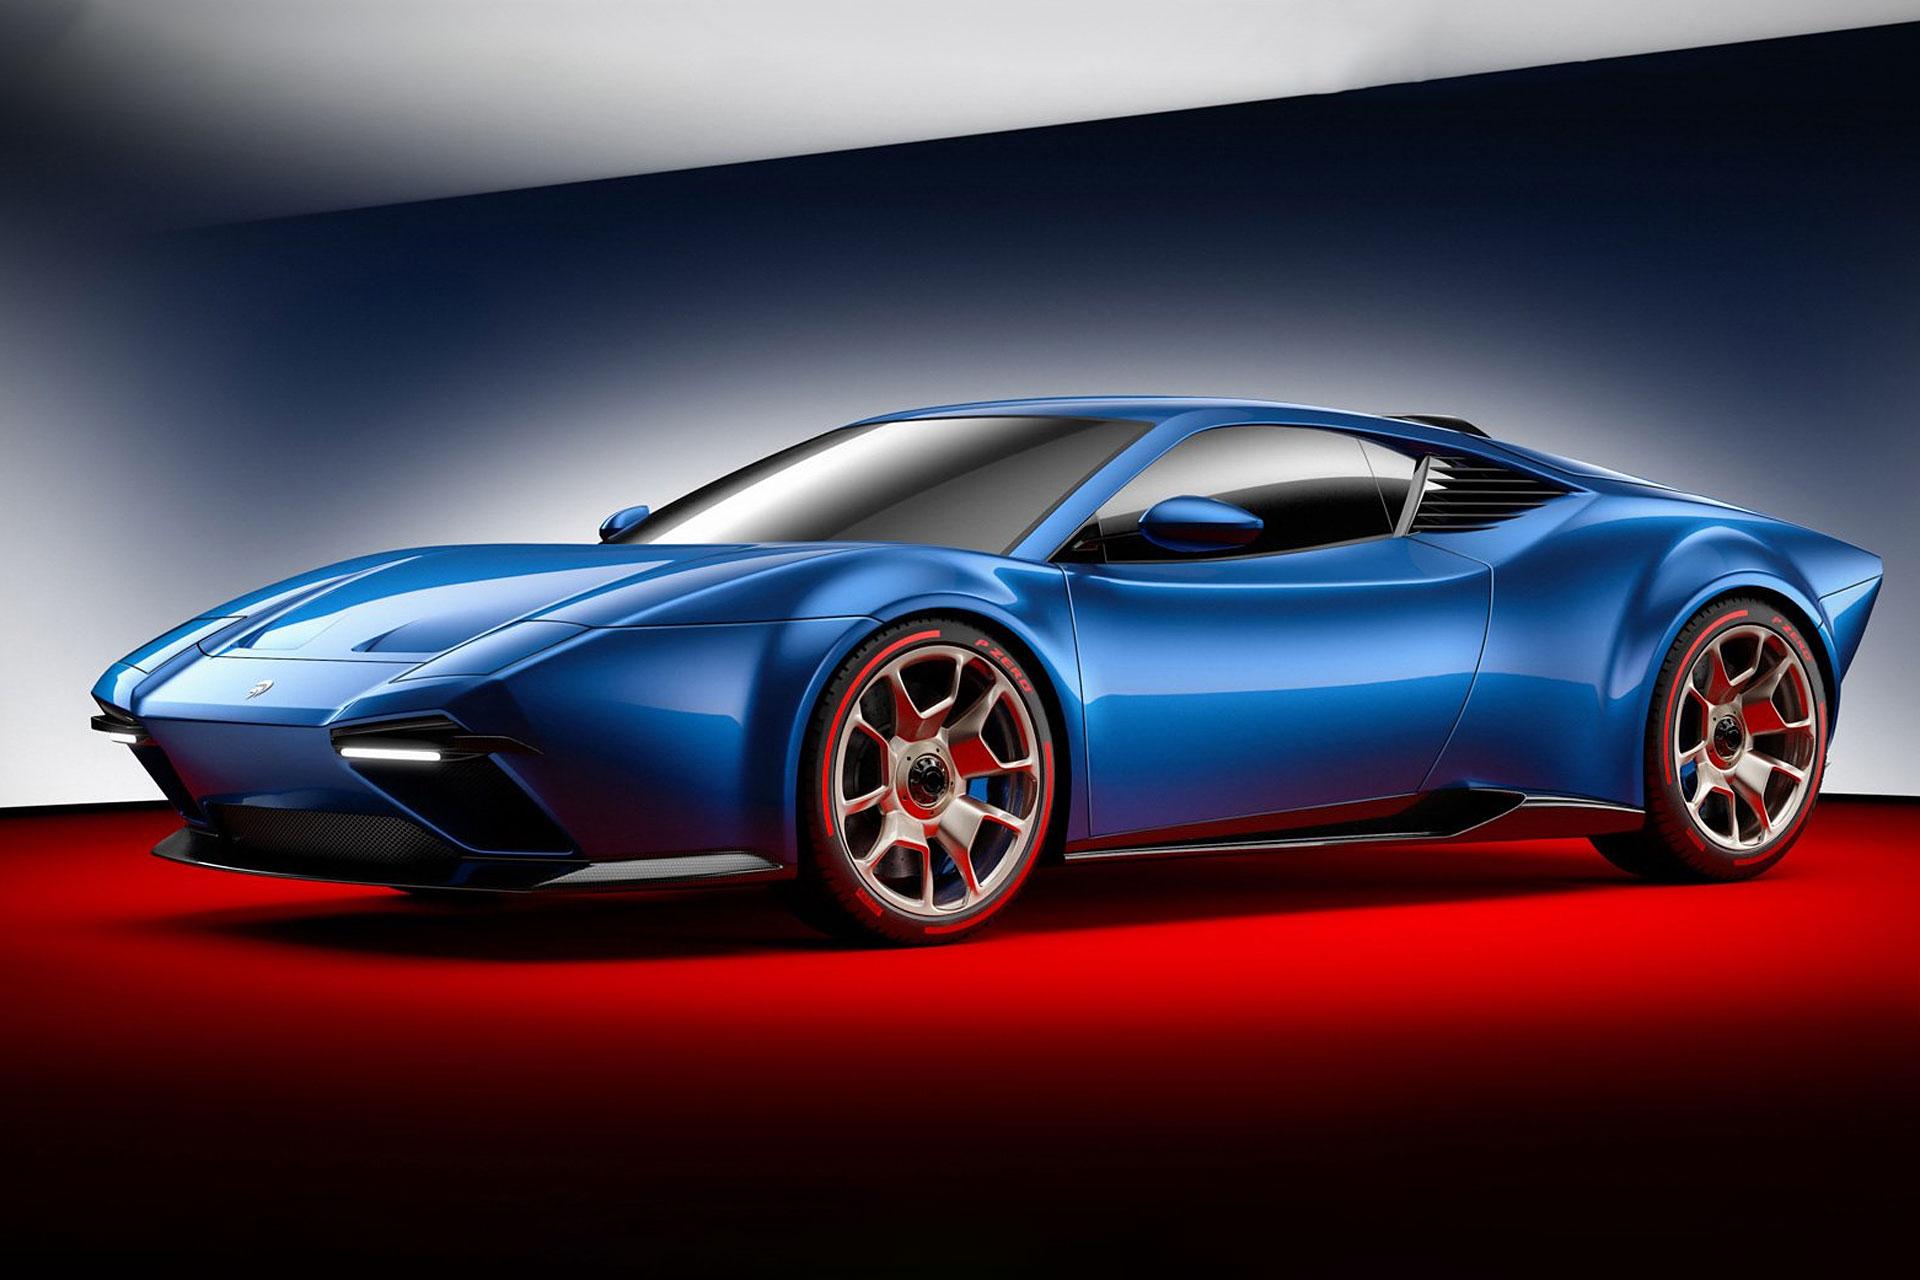 De-Tomaso-Pantera-ARES-Design-Project-Panther-Tuning-1